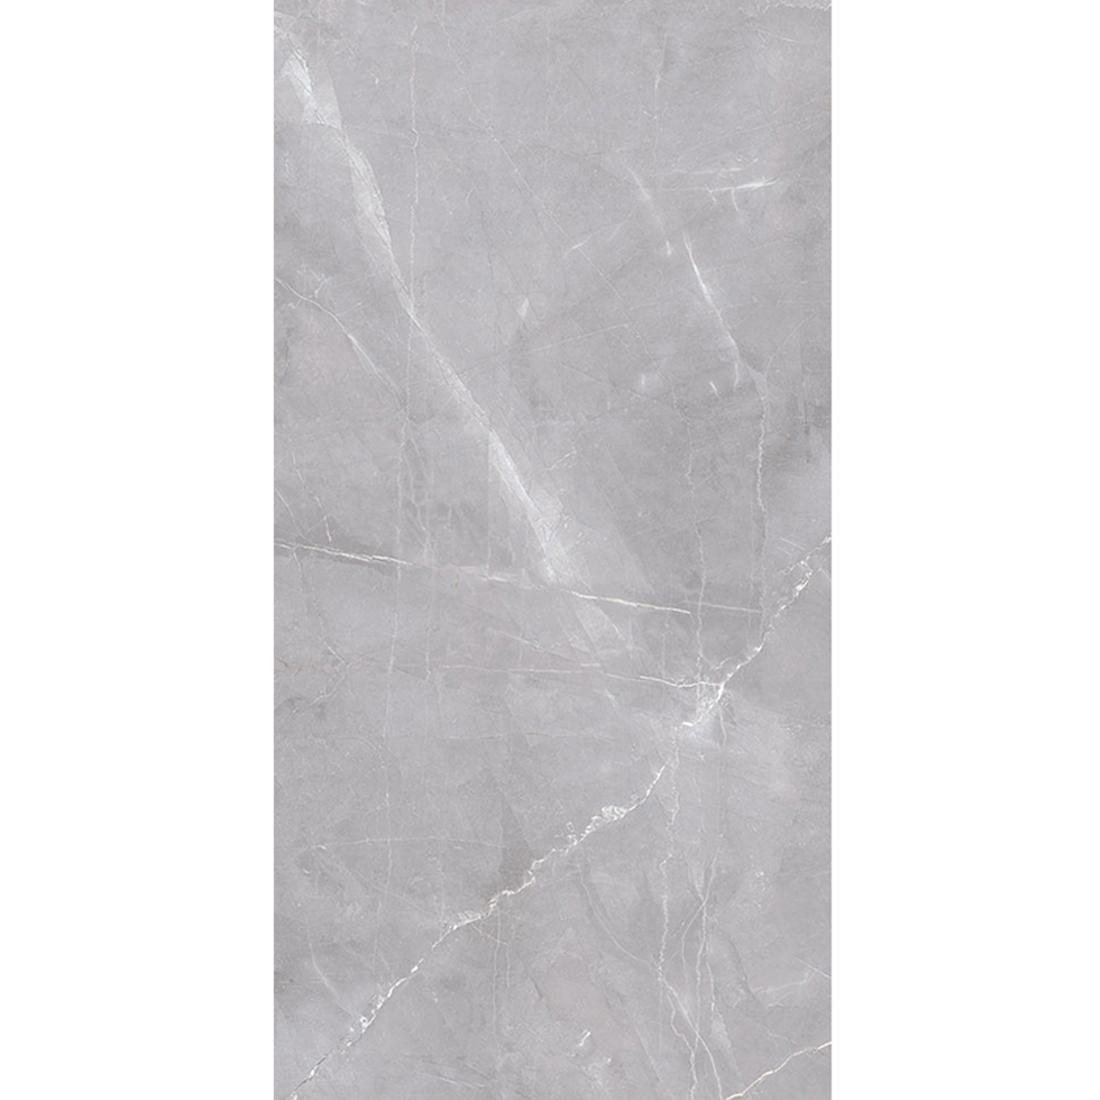 Nitco Aeon Amani N6909-IG Glossy Glazed Vitrified Tile